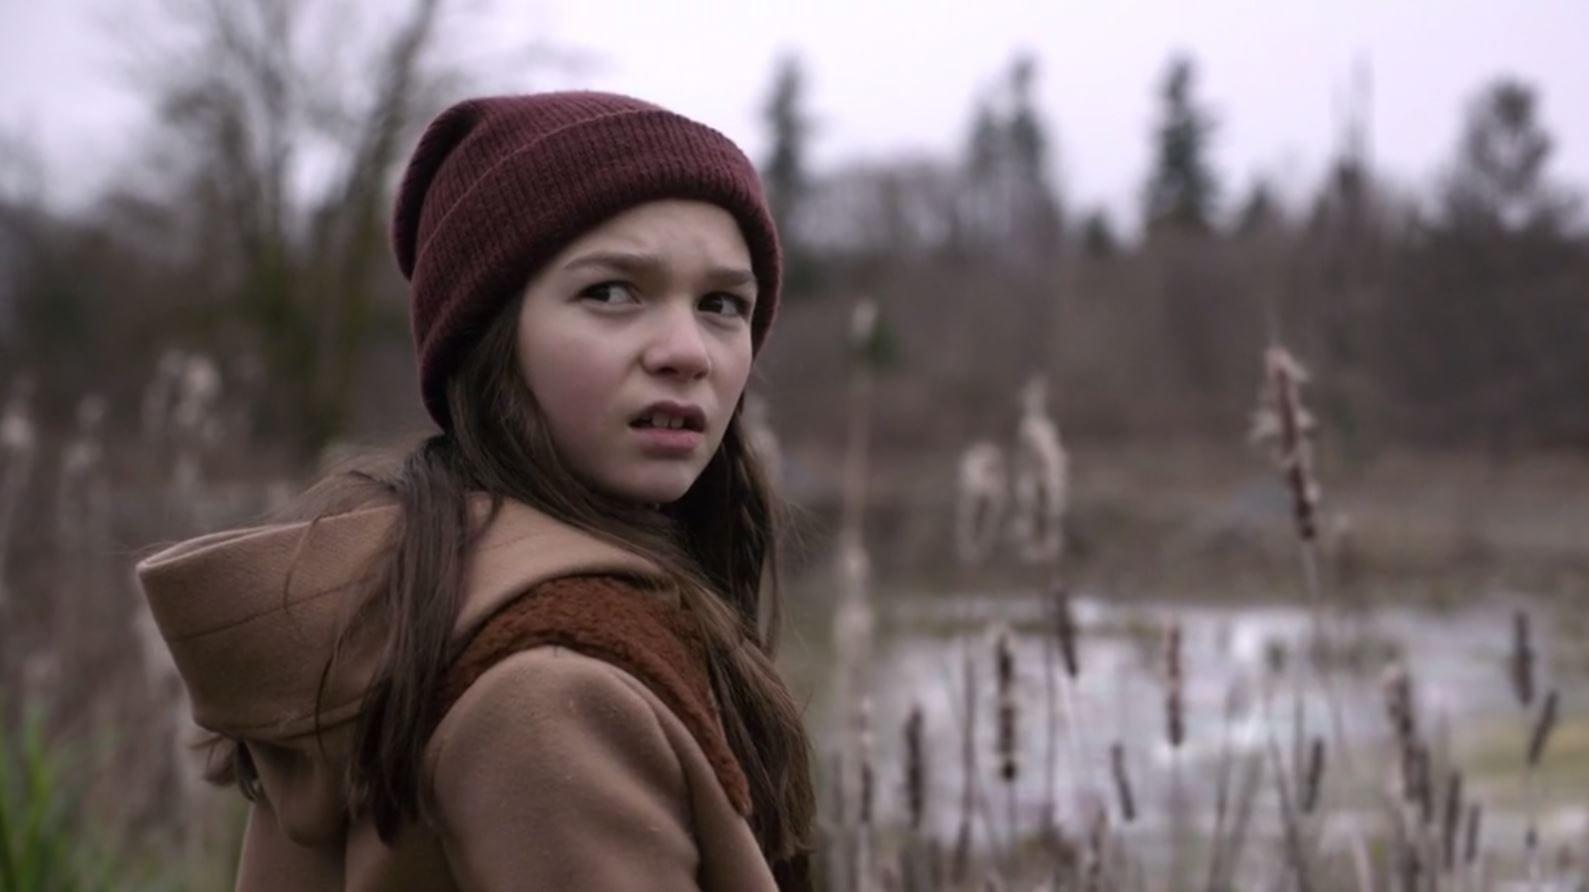 Home Before Dark Season 2 Episode 2 Ending Explained: Who Is The Stalker?